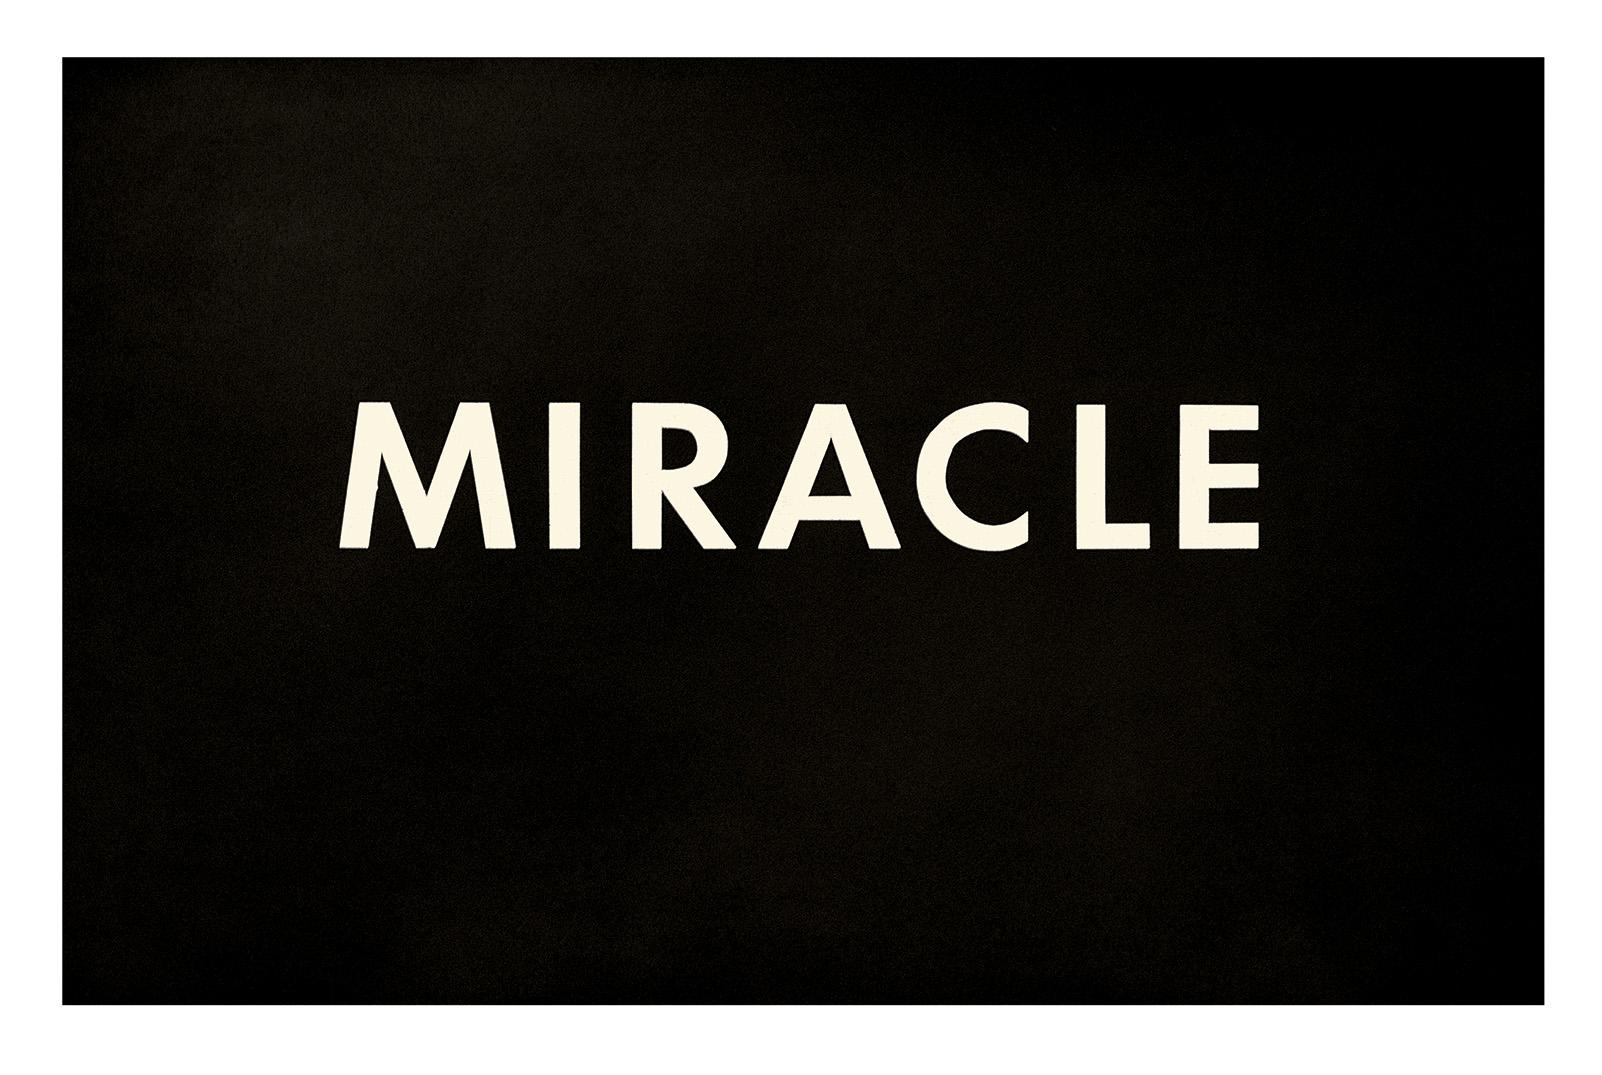 Ed Ruscha Miracle Ed Ruscha